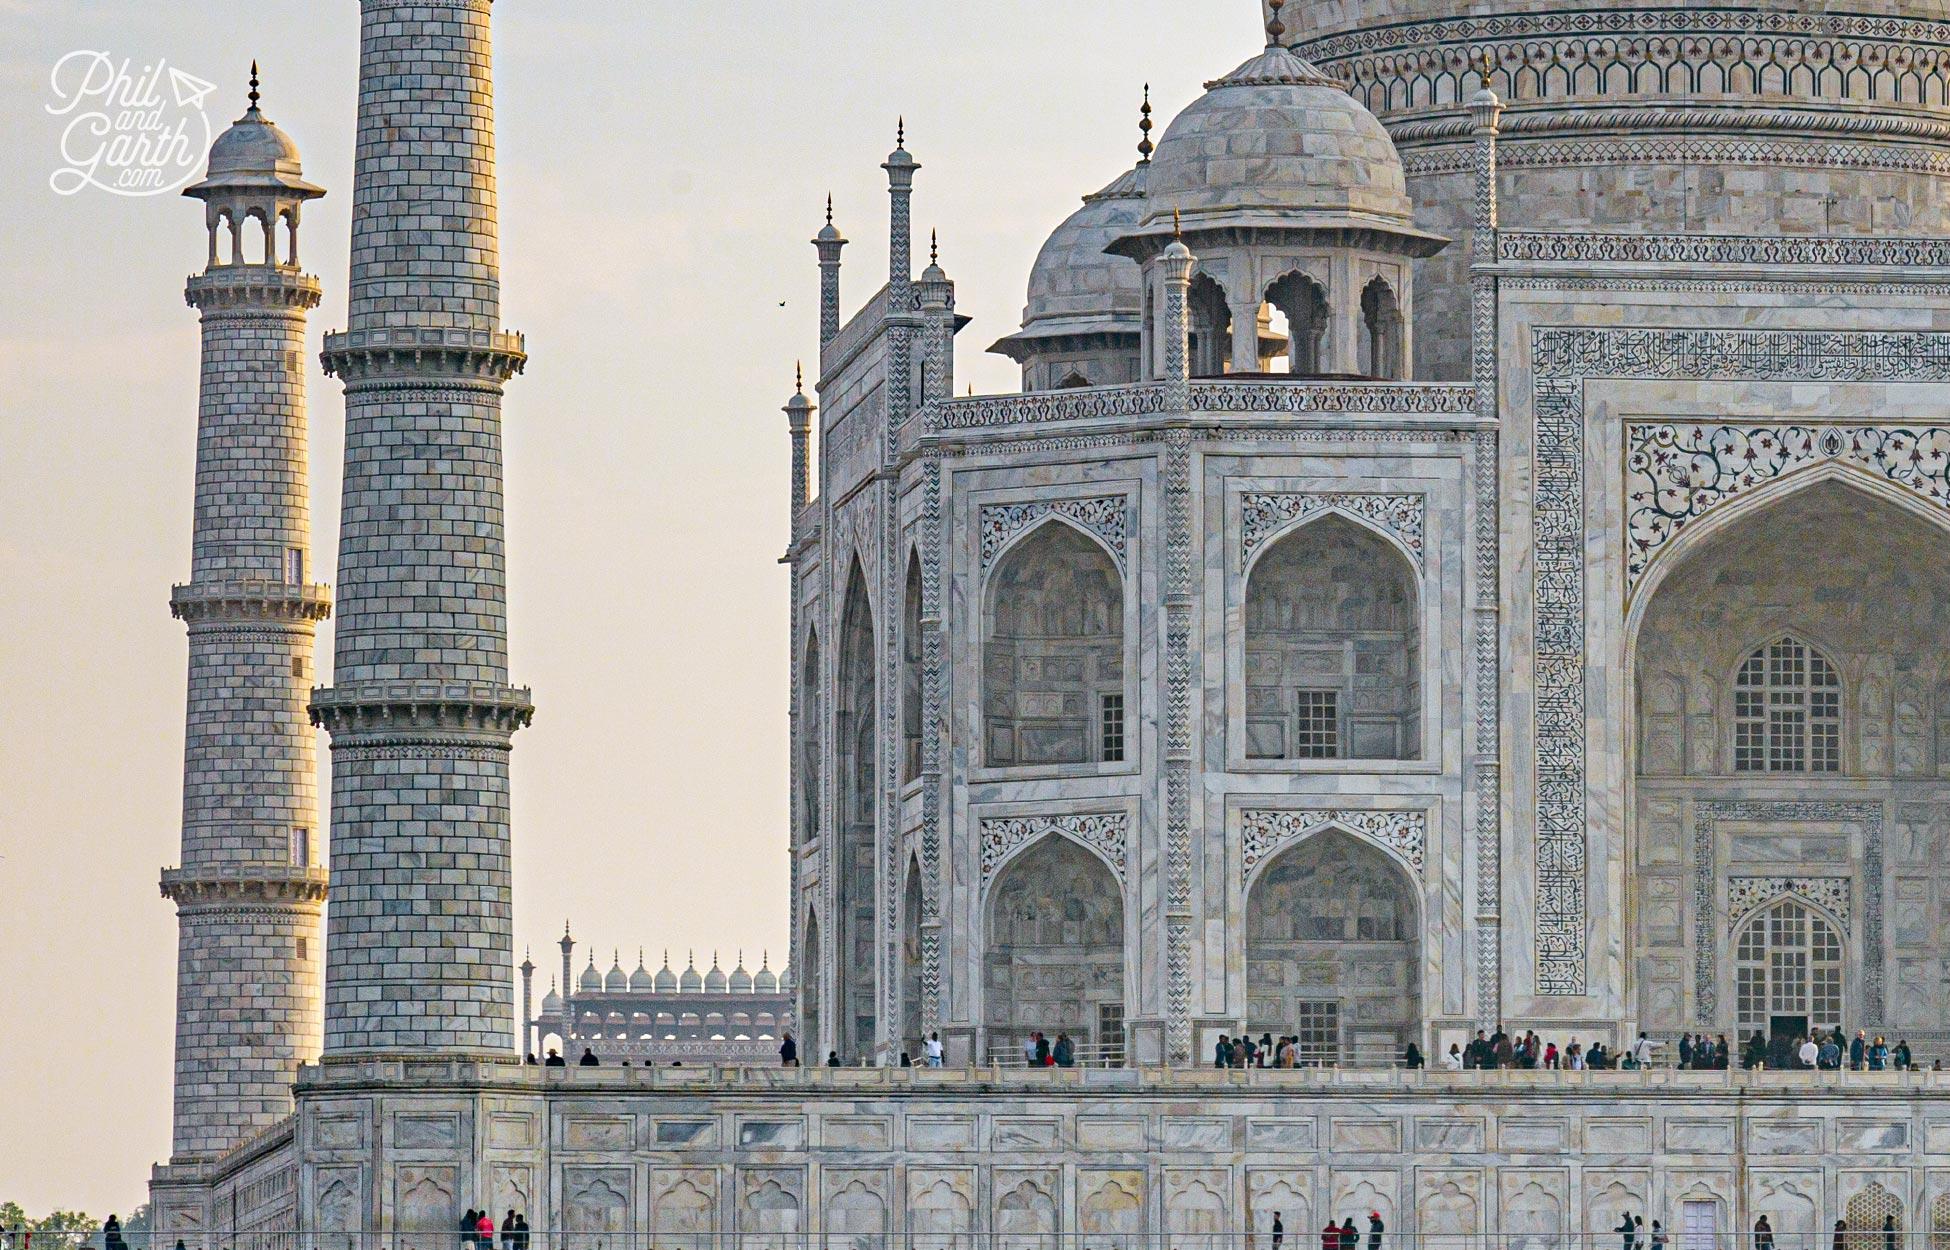 The Taj Mahal mausoleum has the tomb of Mumtaz Mahal